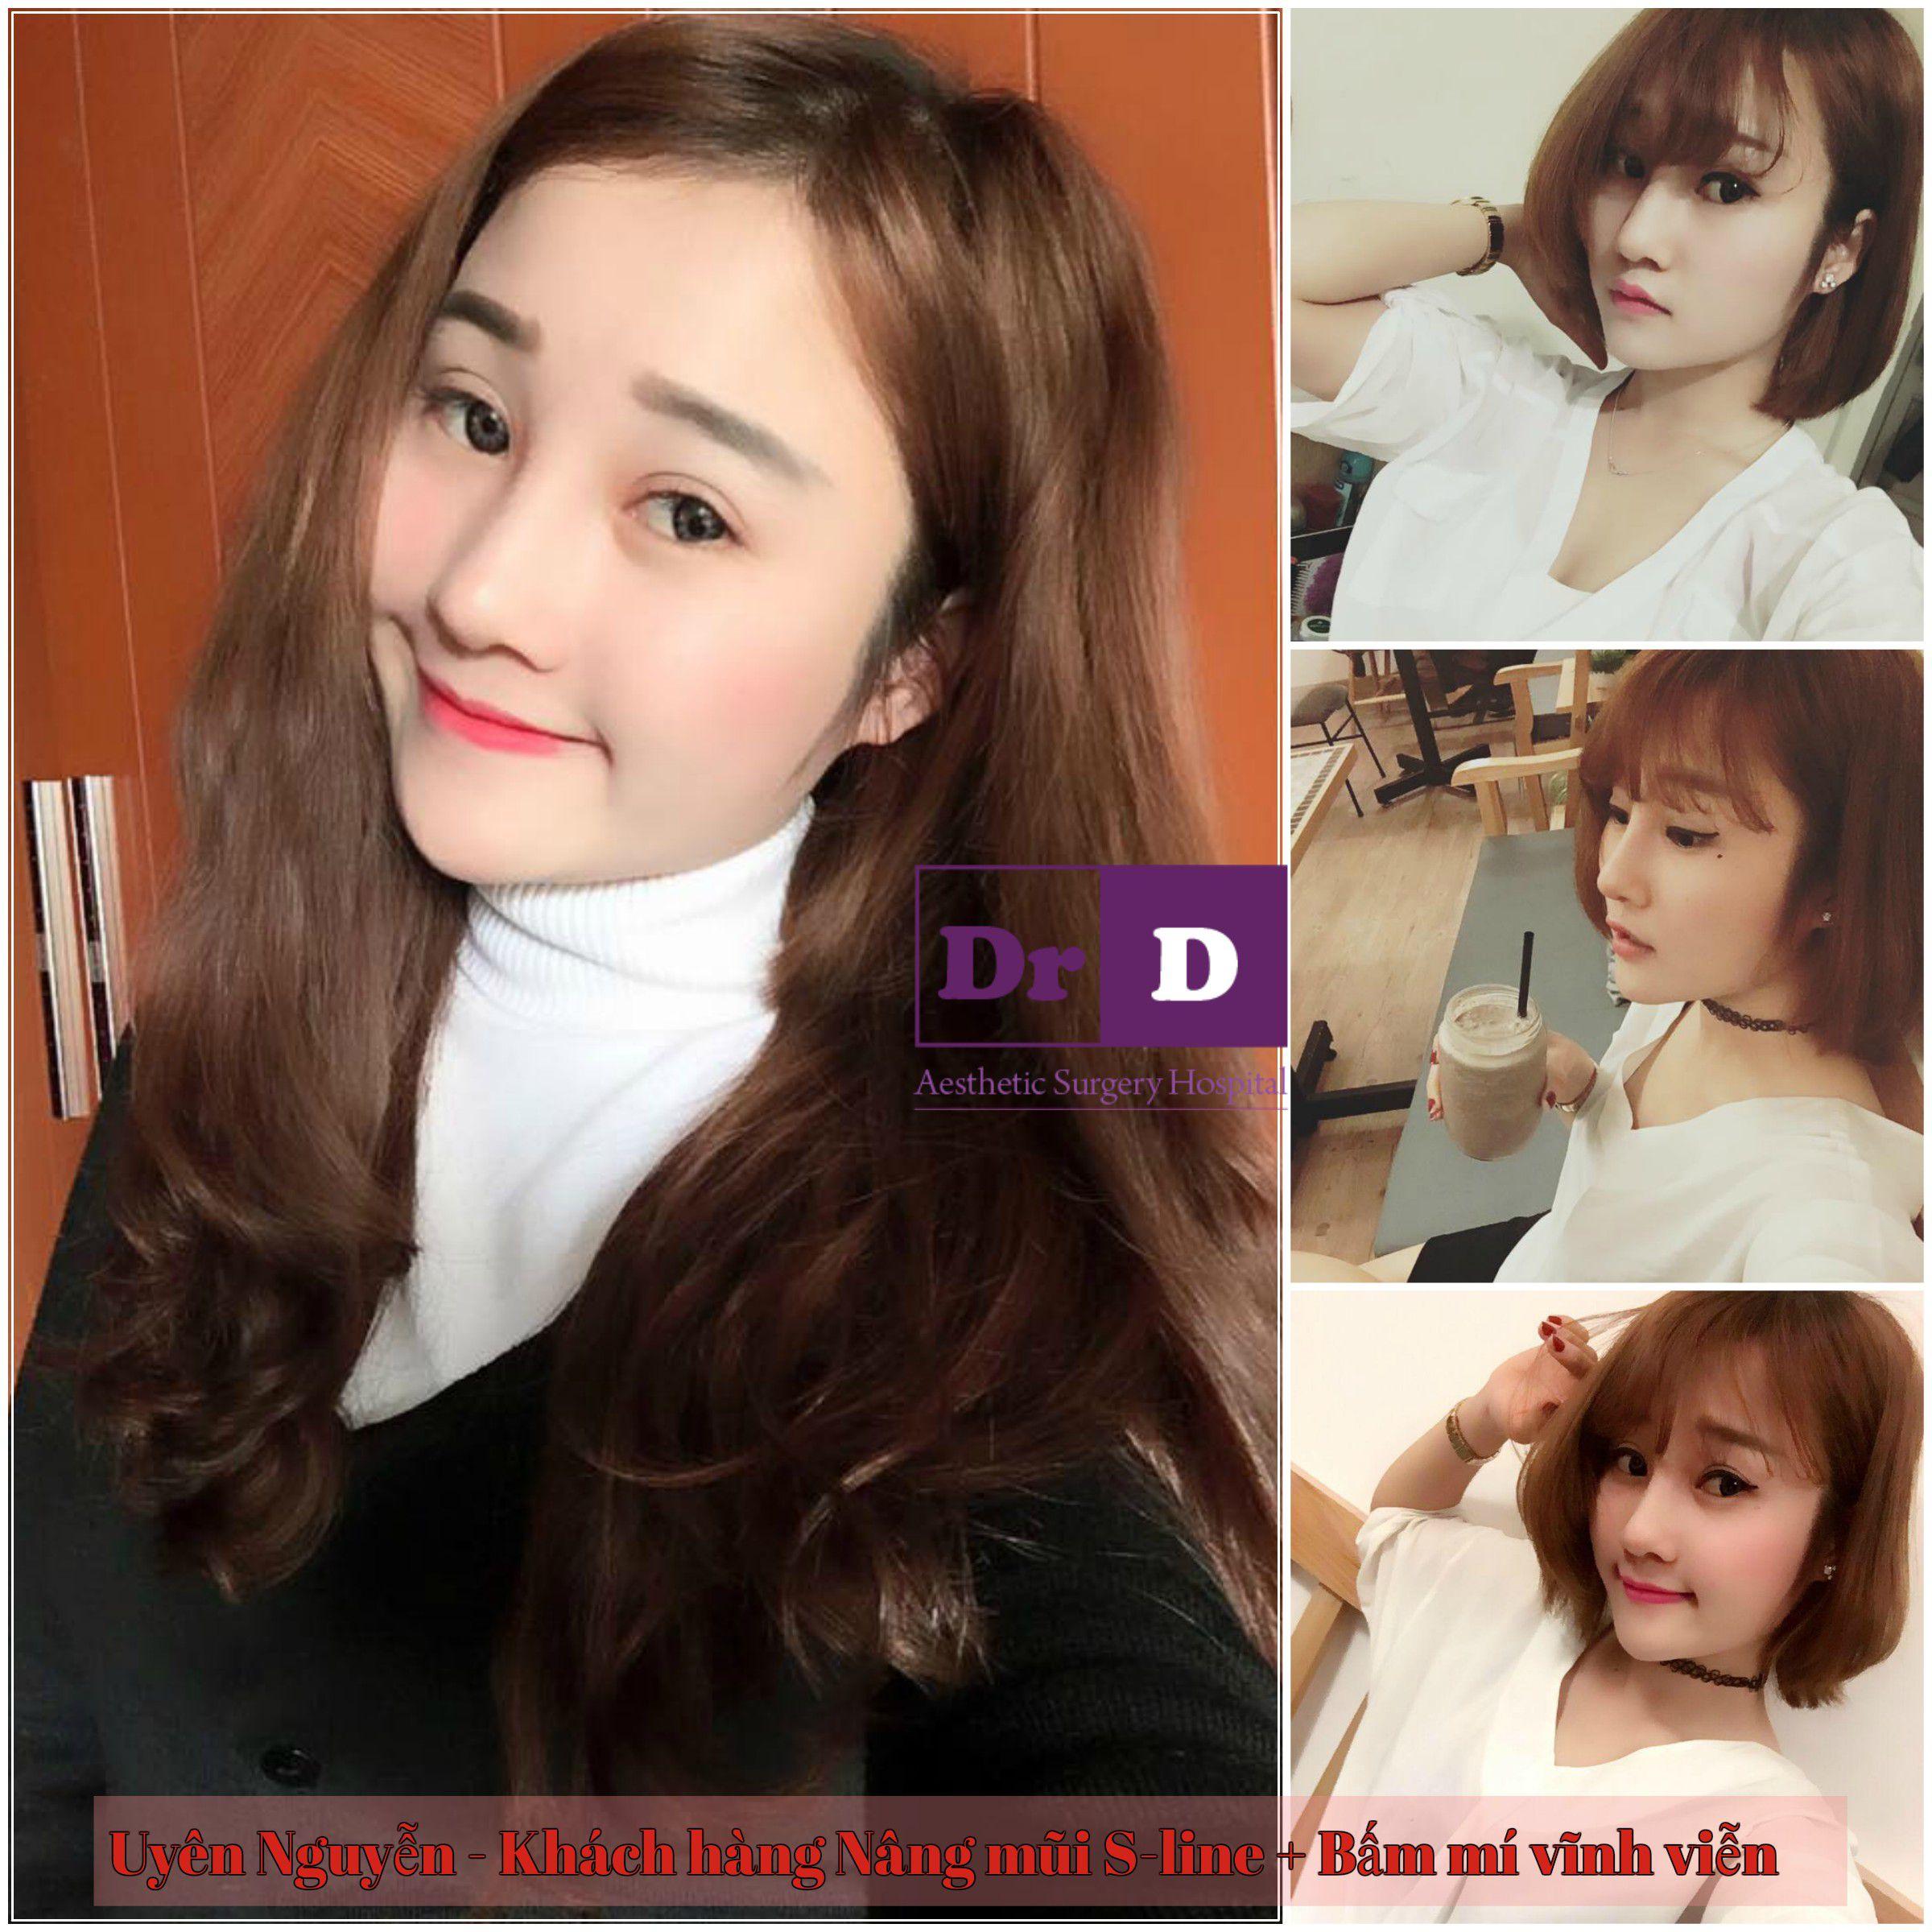 muon-selfie-dep-thi-mat-phai-dep (4) Muốn selfie đẹp thì mặt phải đẹp